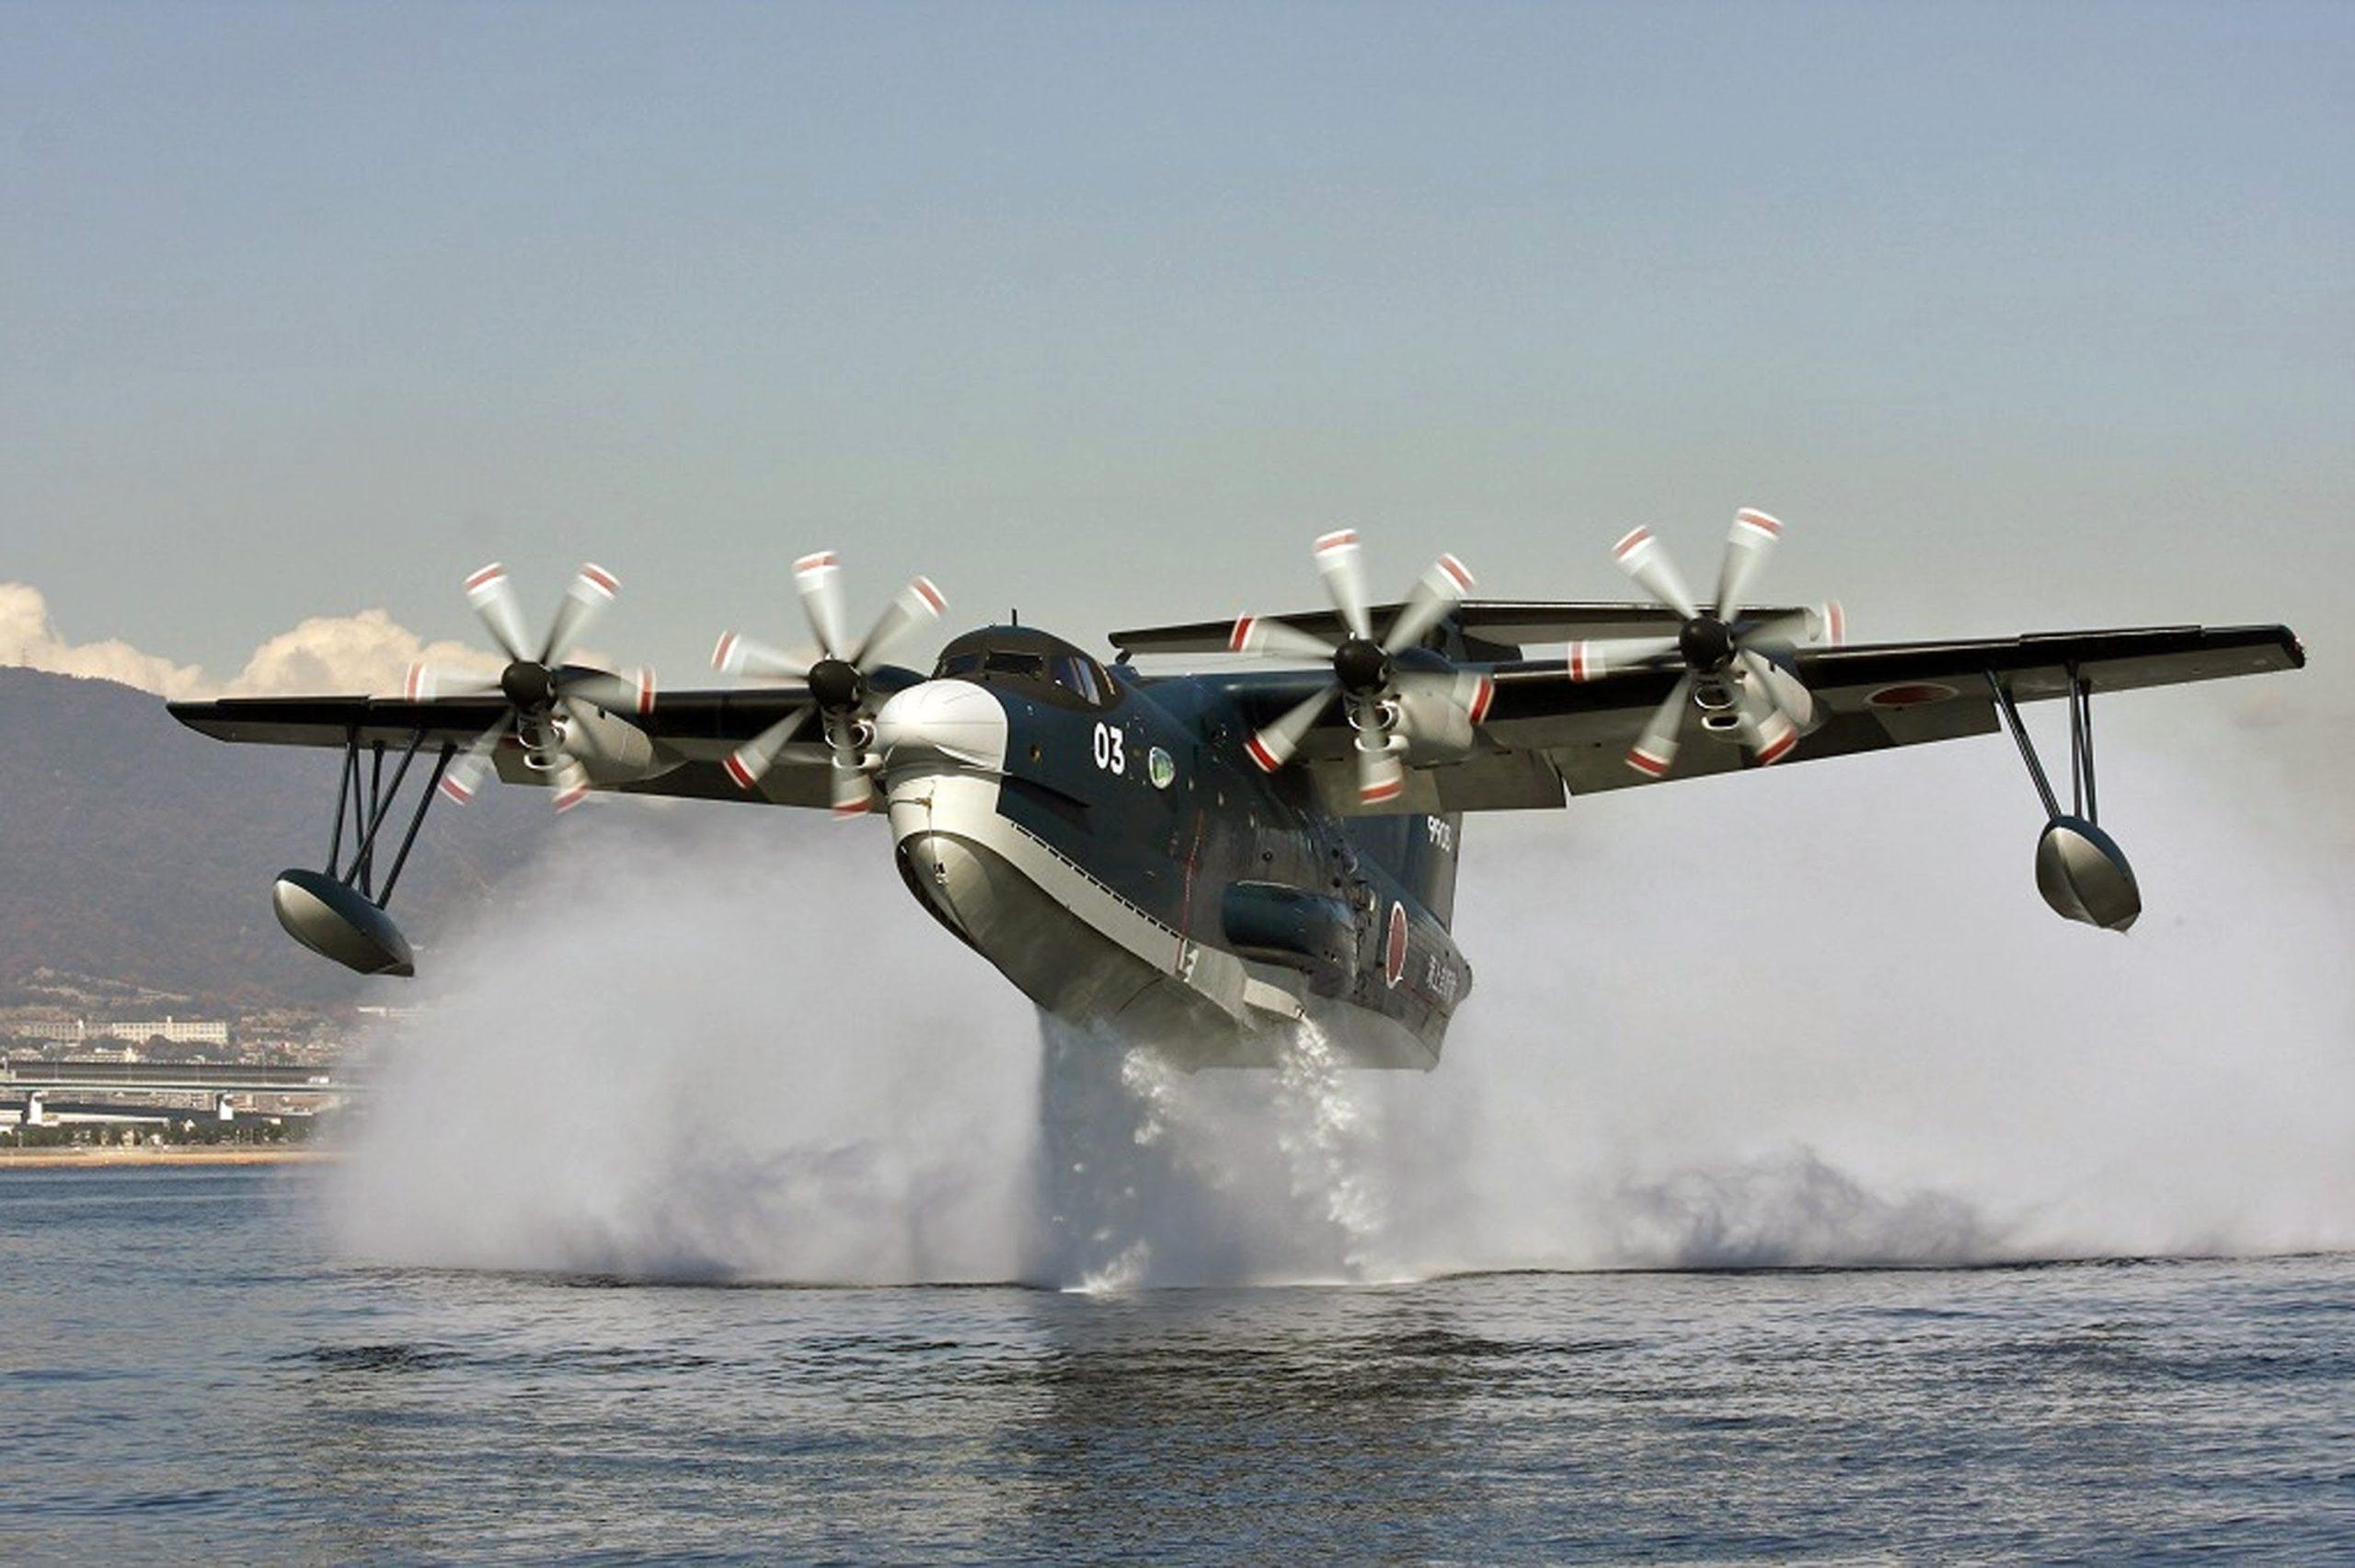 ShinMaywa-US-2-Amphibious-Plane.jpg